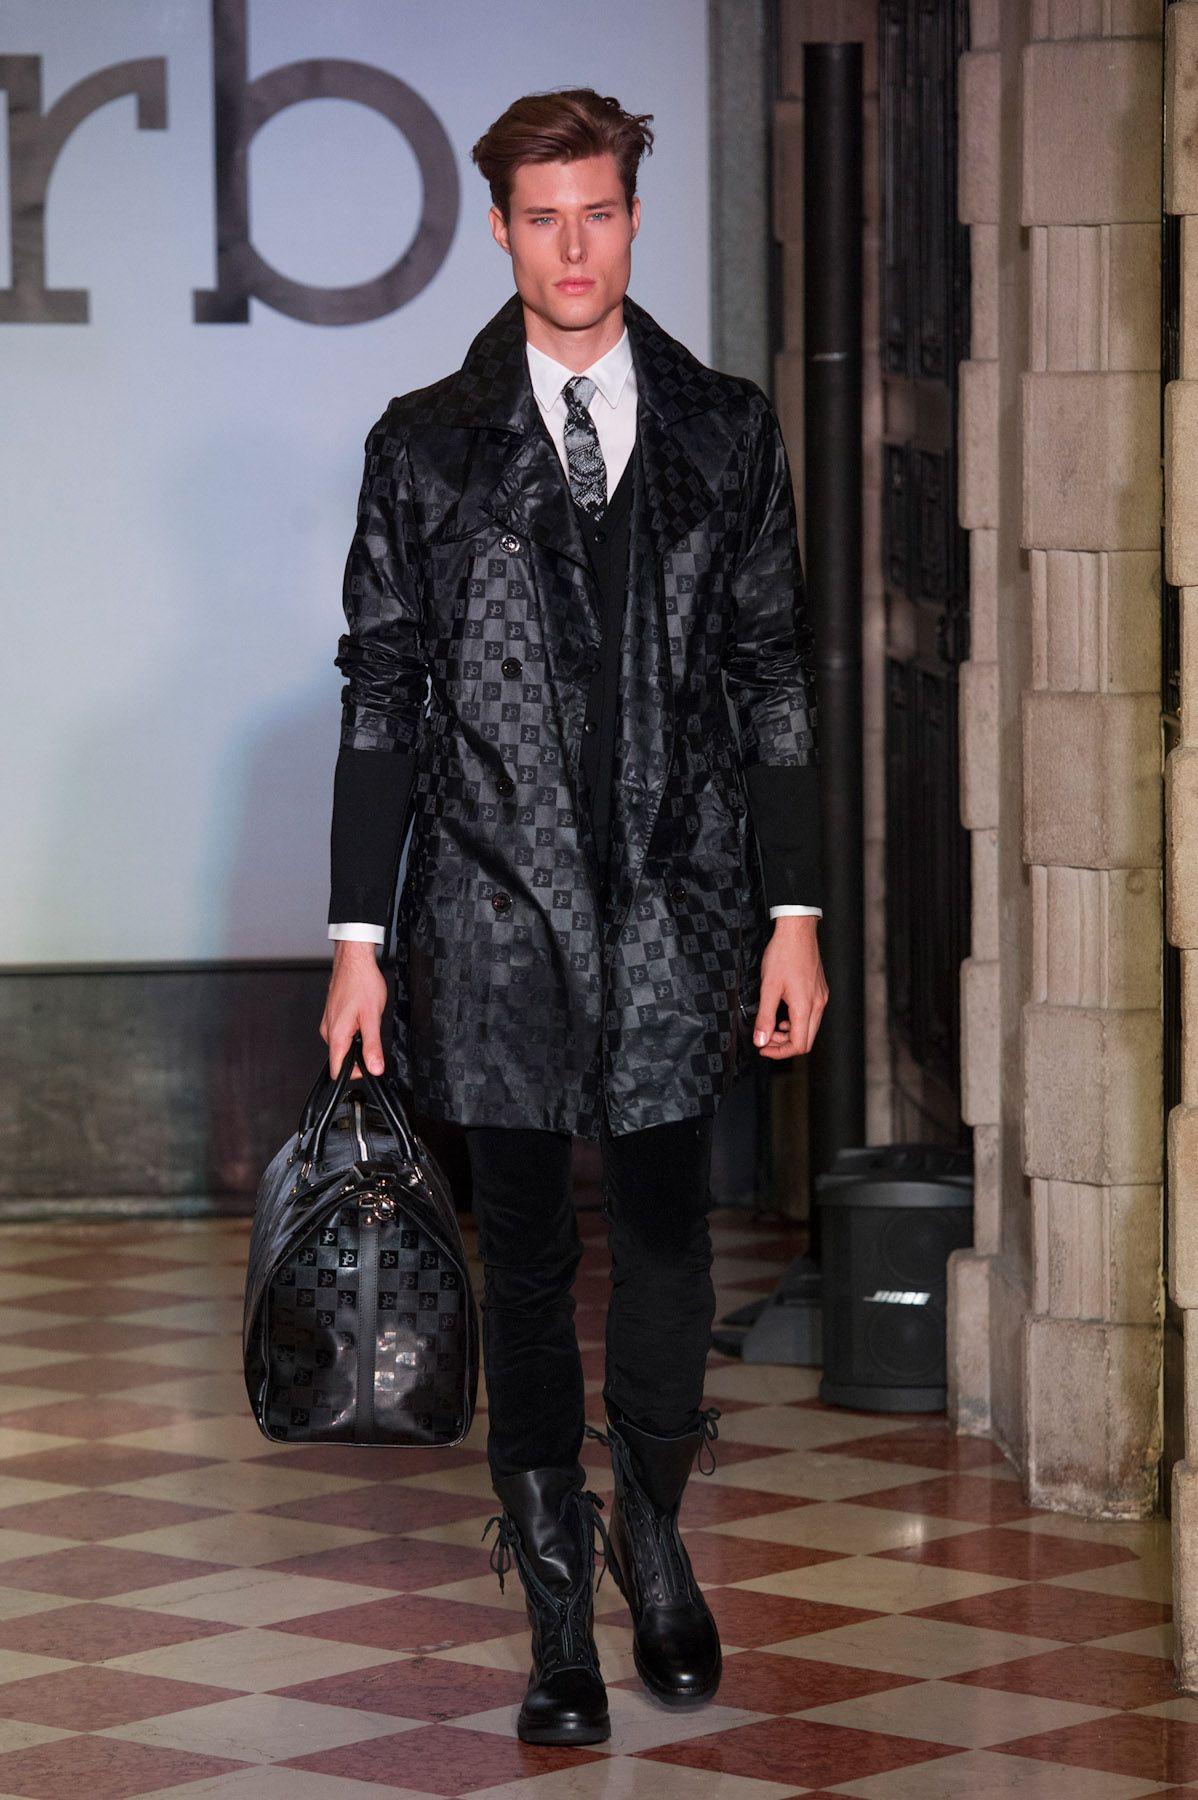 Roccobarocco MEN | Milão | Inverno 2014 RTW